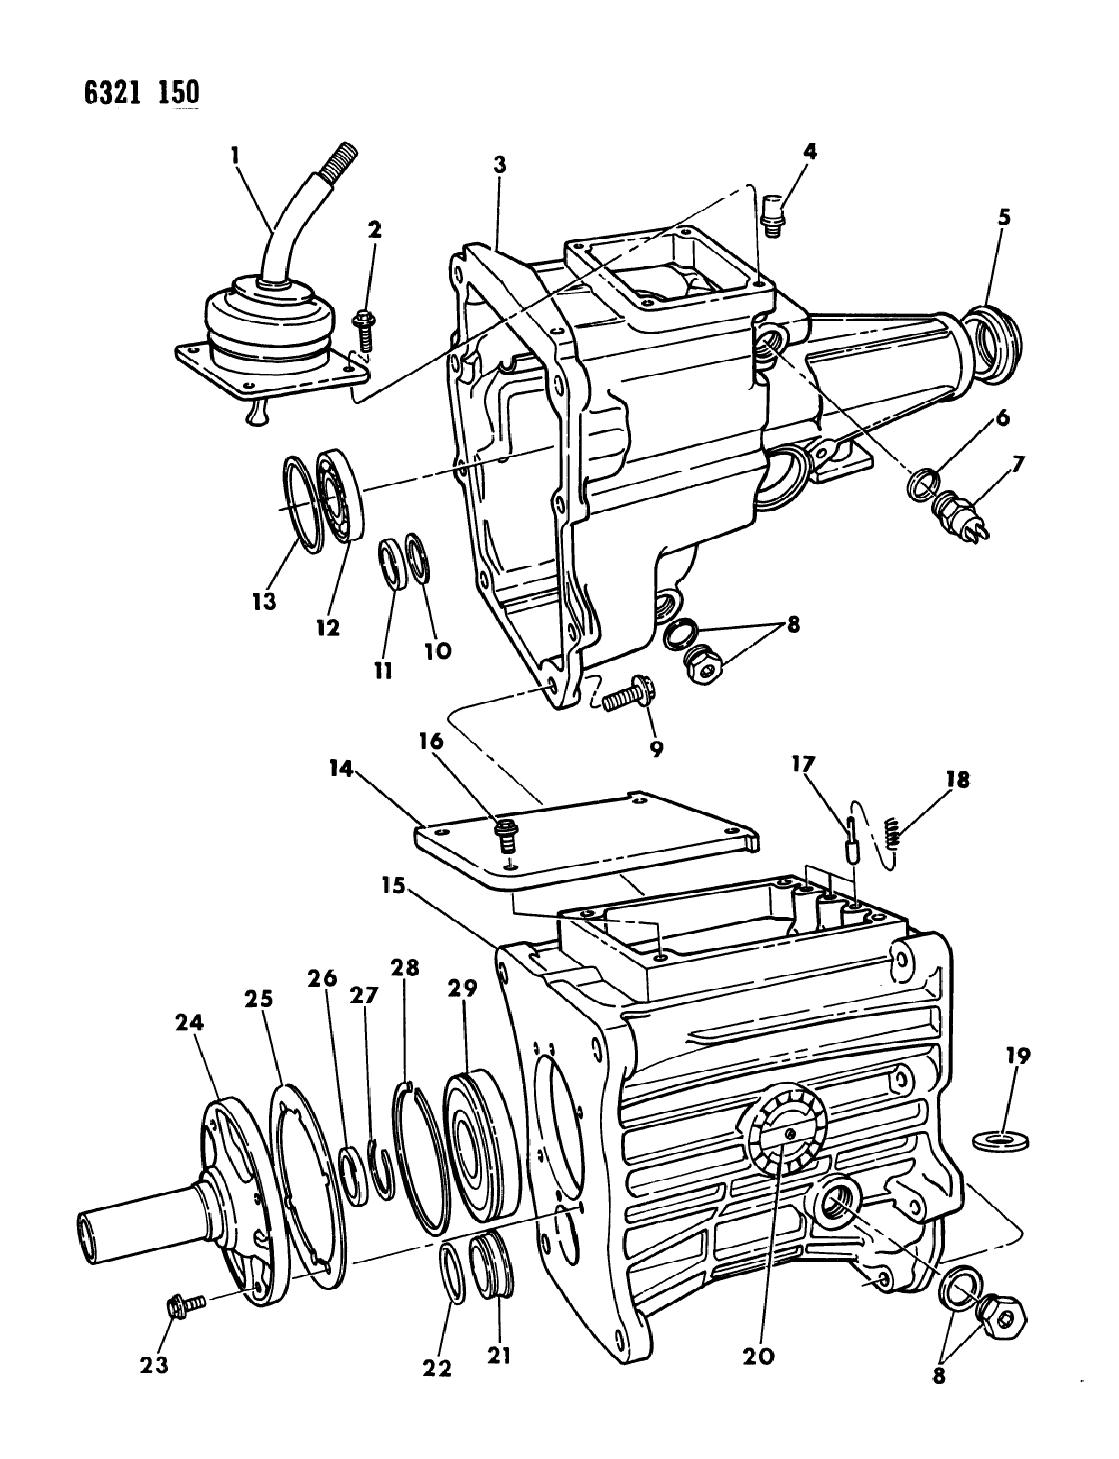 1987 dodge dakota transmission case extension miscellaneous parts rh moparpartsgiant com Dodge Dakota Automatic Transmission Shift Module 5 Speed Manual Transmission